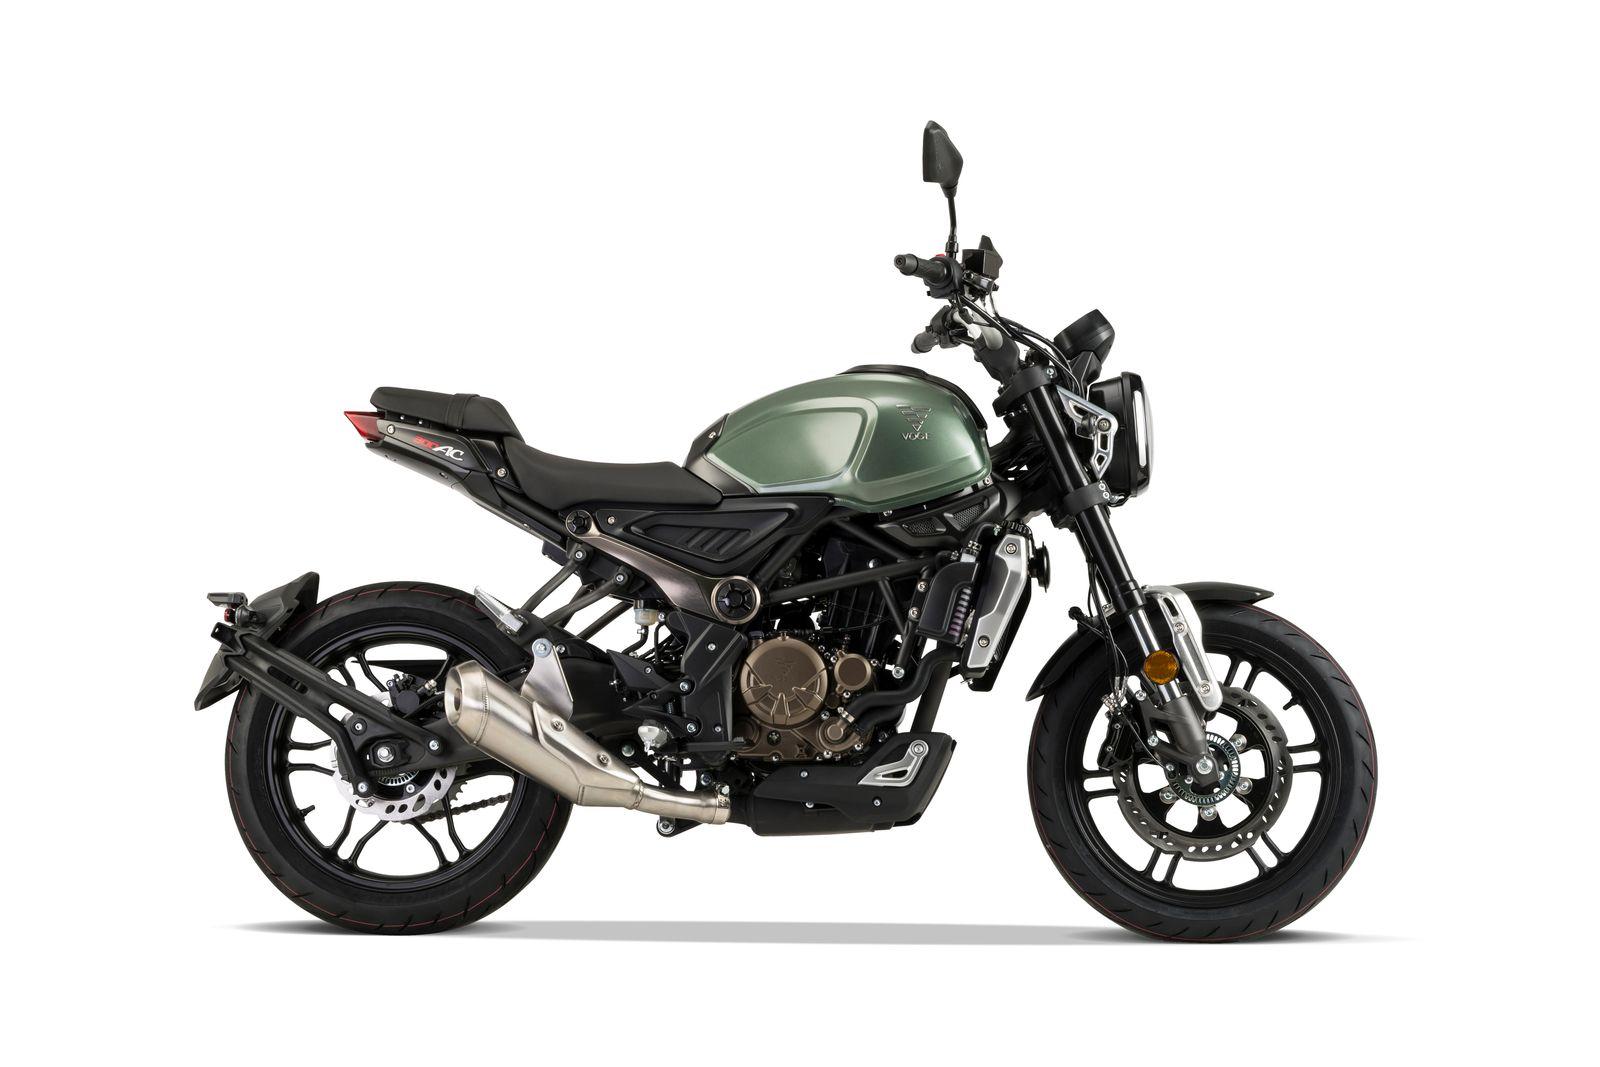 Motorräder aus China: Voge 300AC